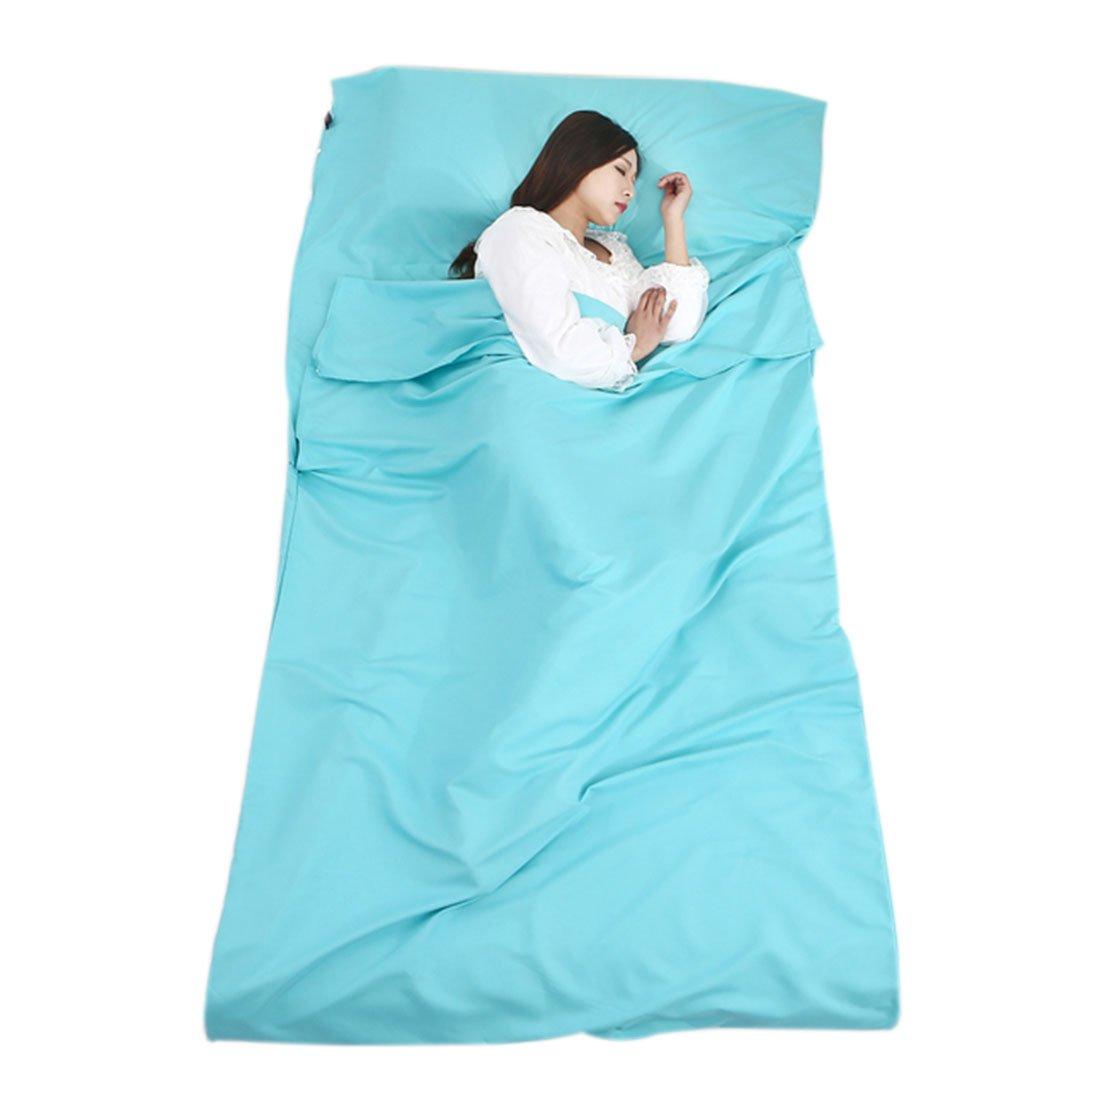 "enerhu Sleepingバッグライナーホテル大人用シート軽量ポータブル旅行キャンプ睡眠袋シングルダブルサイズ 115*210cm/45*83"" SINGLE MA0554-4-1S/QLUSFBA B07BLQHR4Y 115*210cm/45*83"" SINGLE,4# Blue"